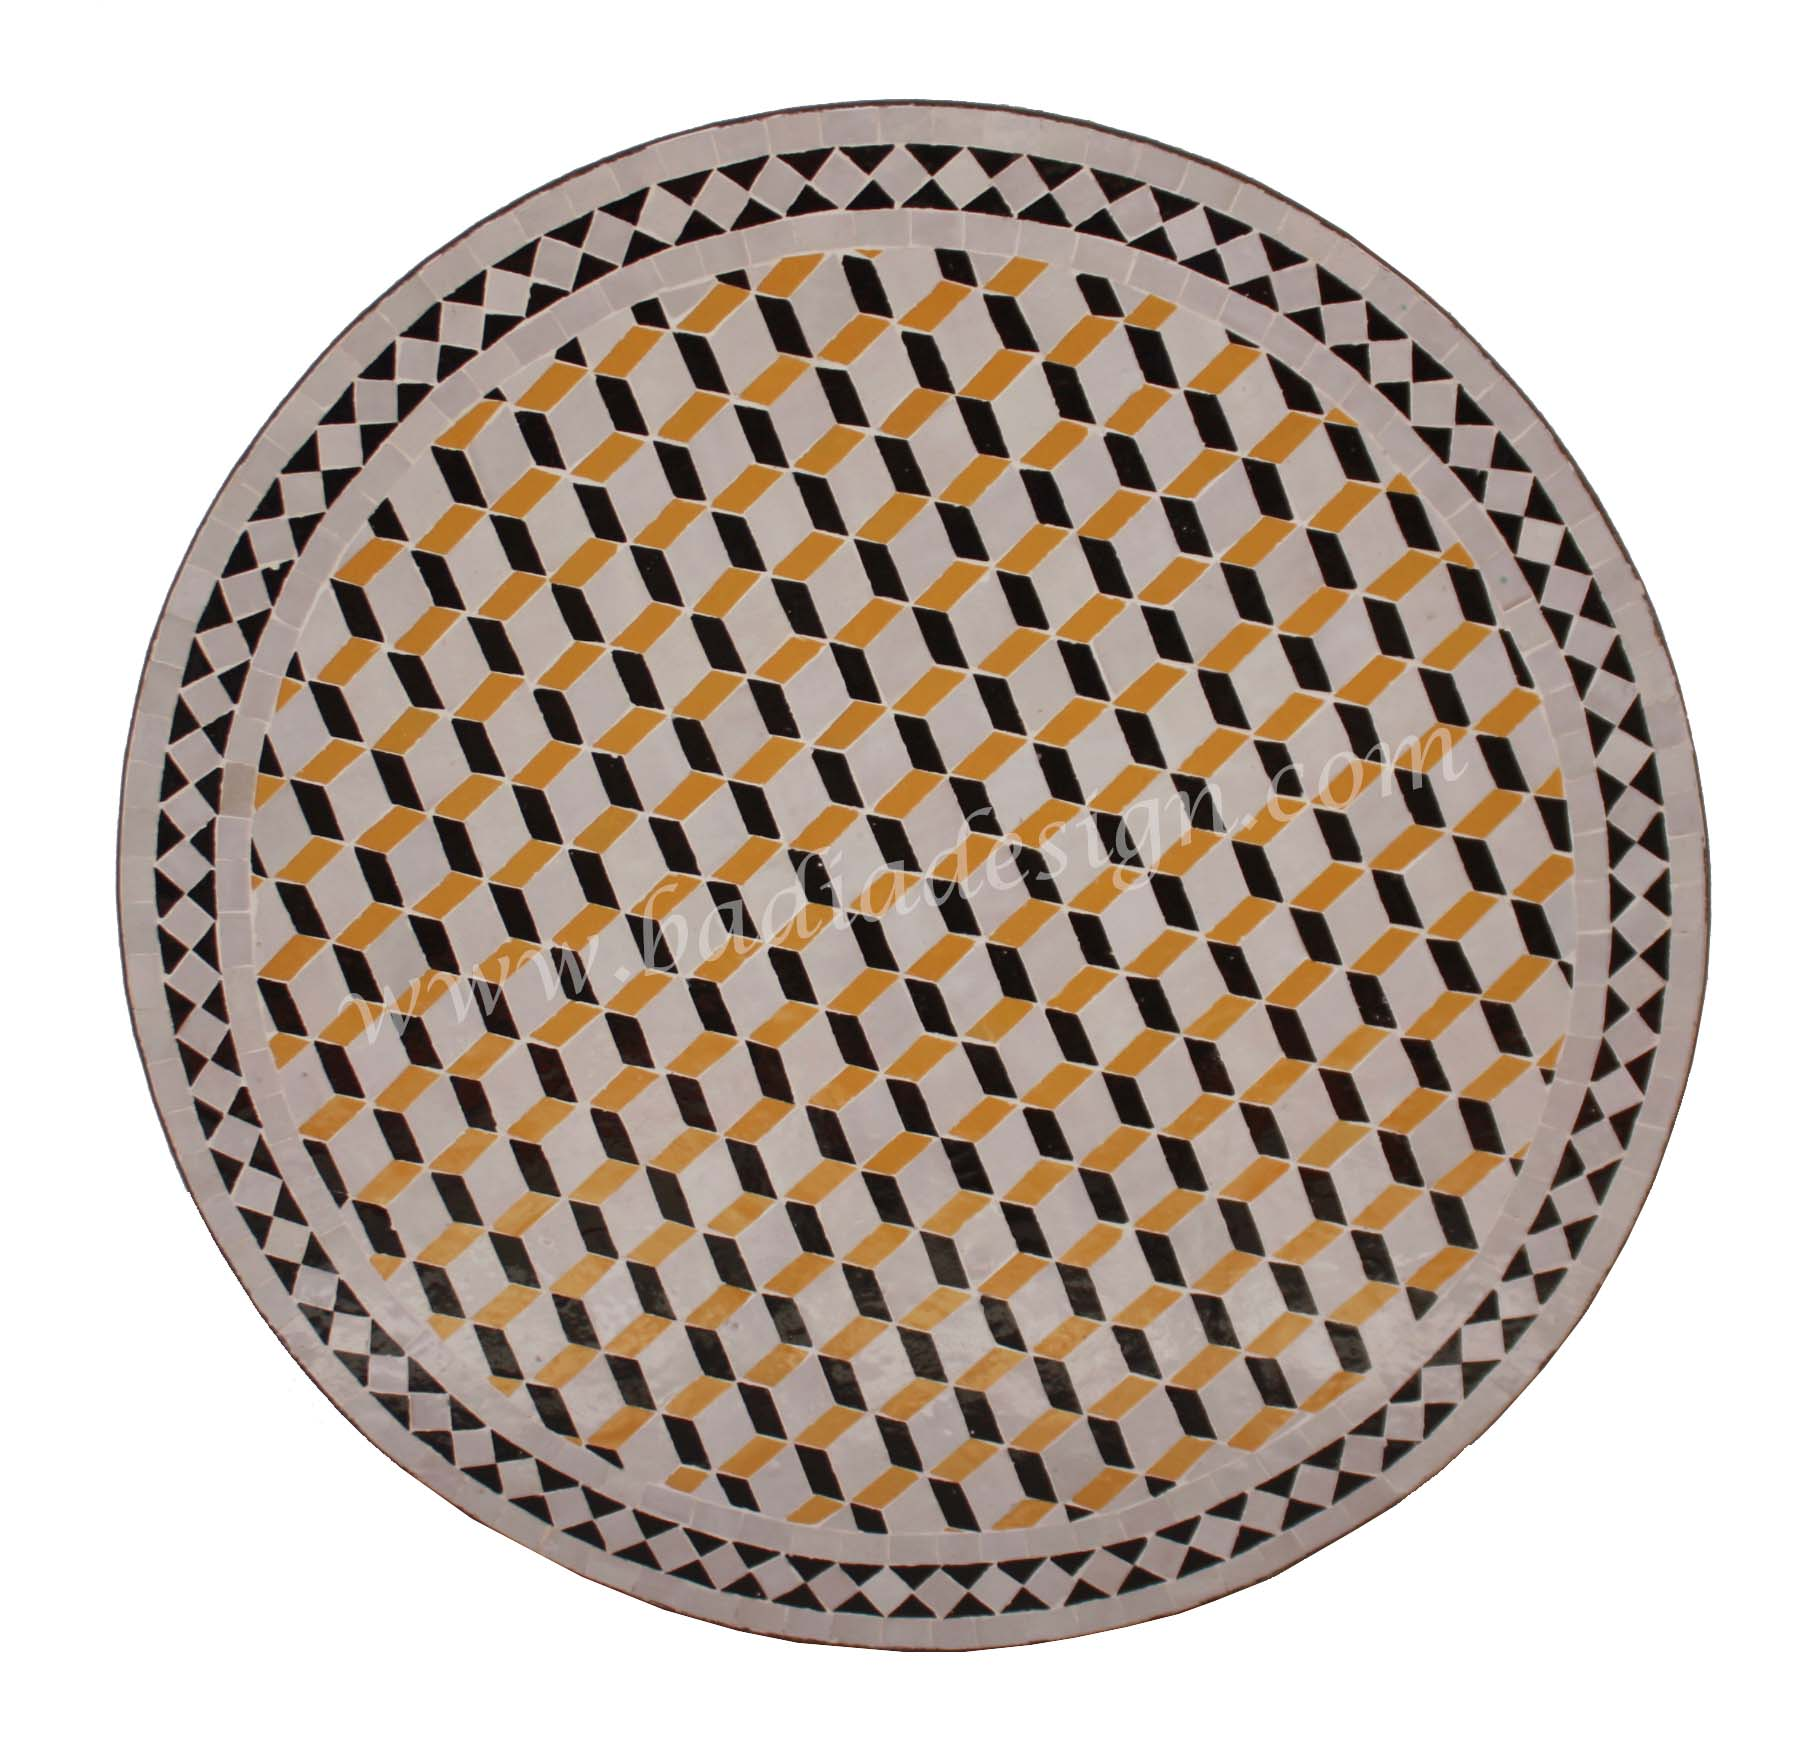 moroccan-tile-table-top-mtr249.jpg